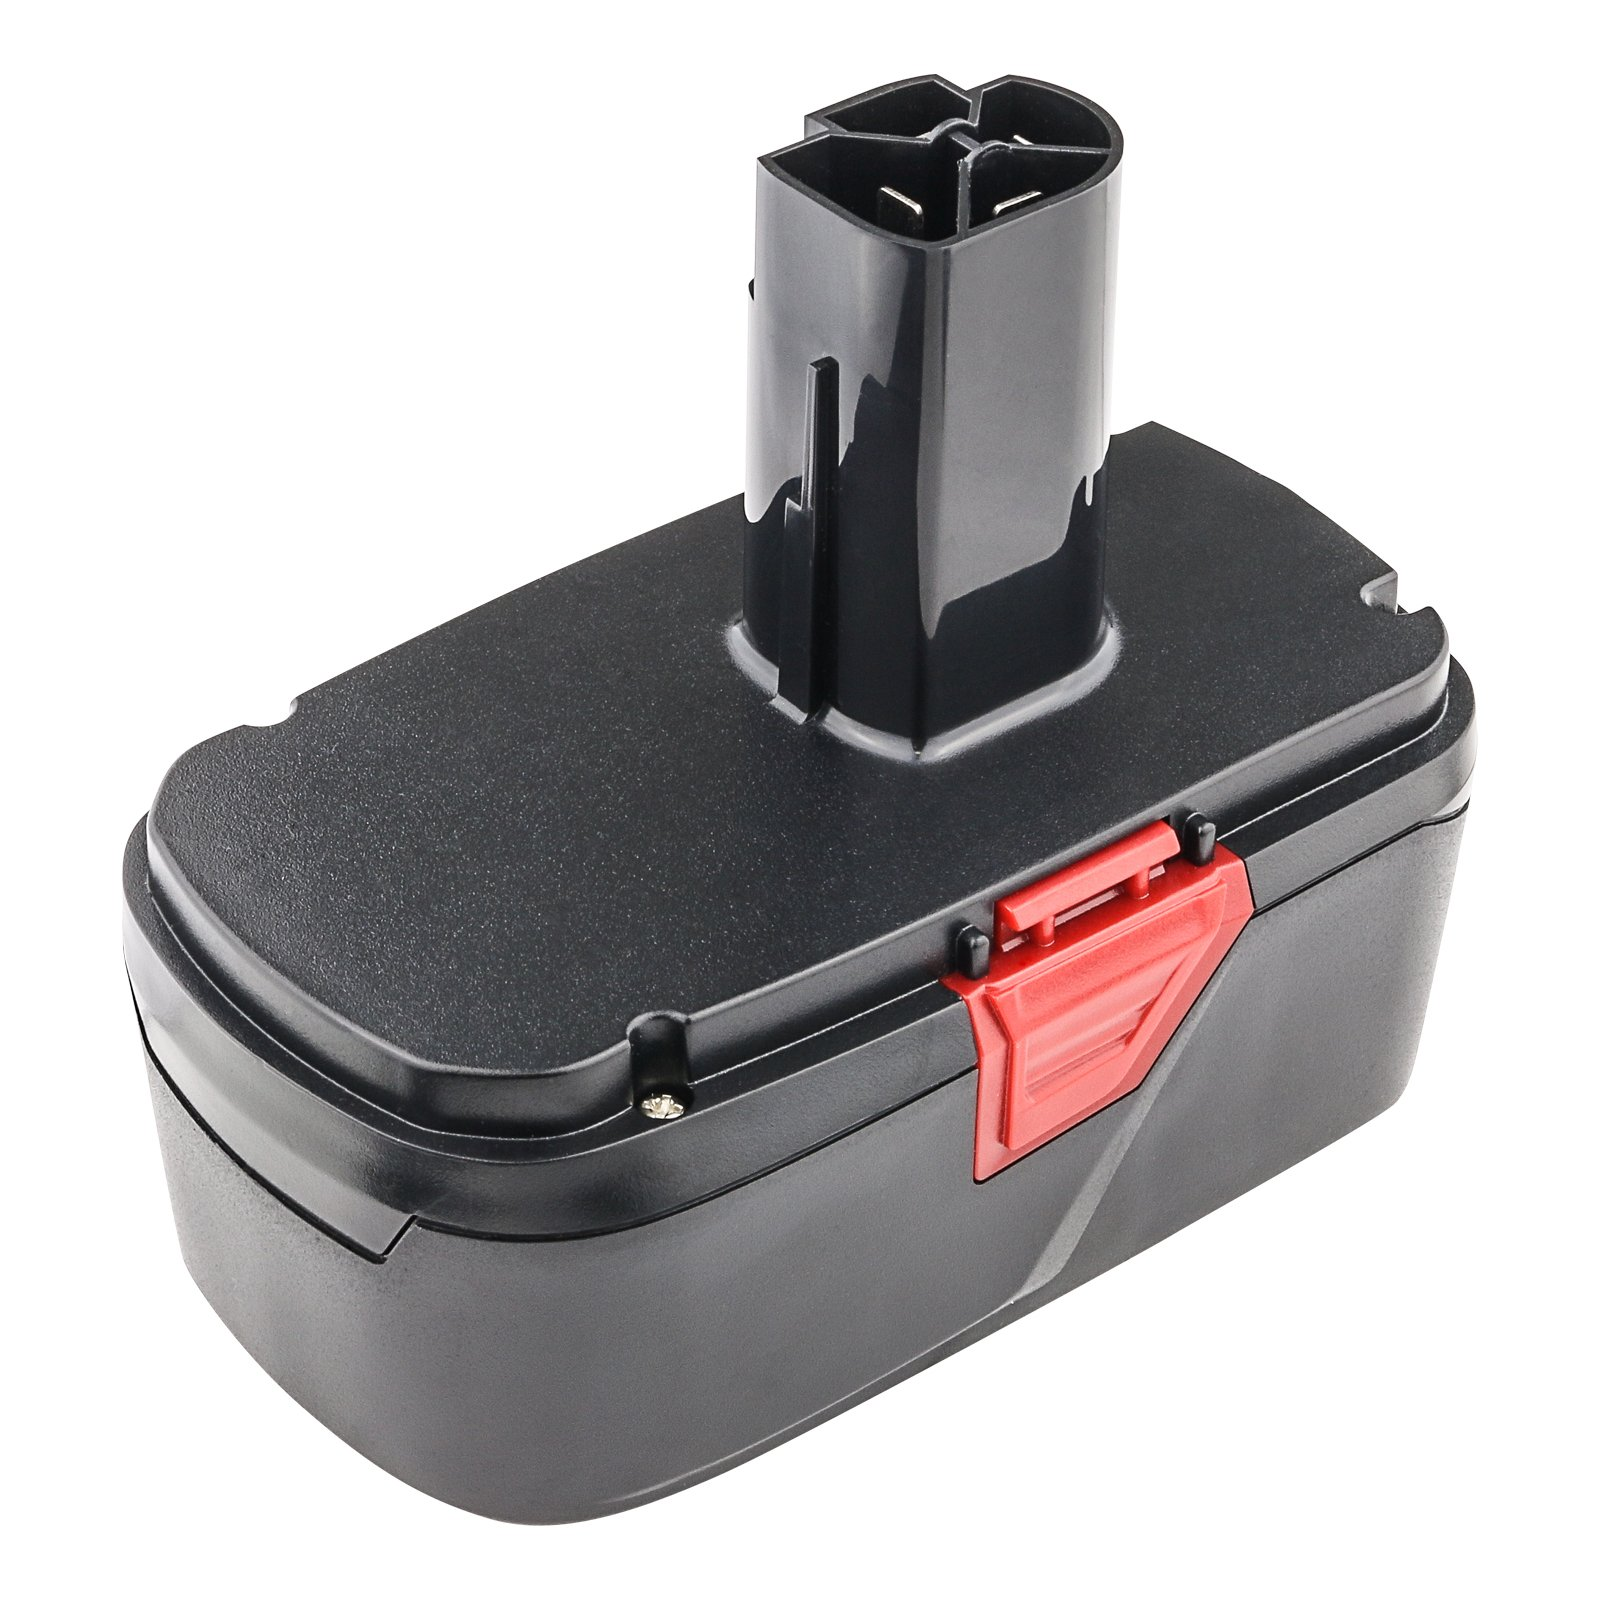 Kastar 11375 Battery (1 Pack), Ni-MH 19.2V 3000mAh, Replacement for Craftsman C3, 130279005, 11375, 11376, 11045, 1323903, 315.115410, 315.11485, 315.114850, 315.114852 Craftsman 19.2 Volt Battery